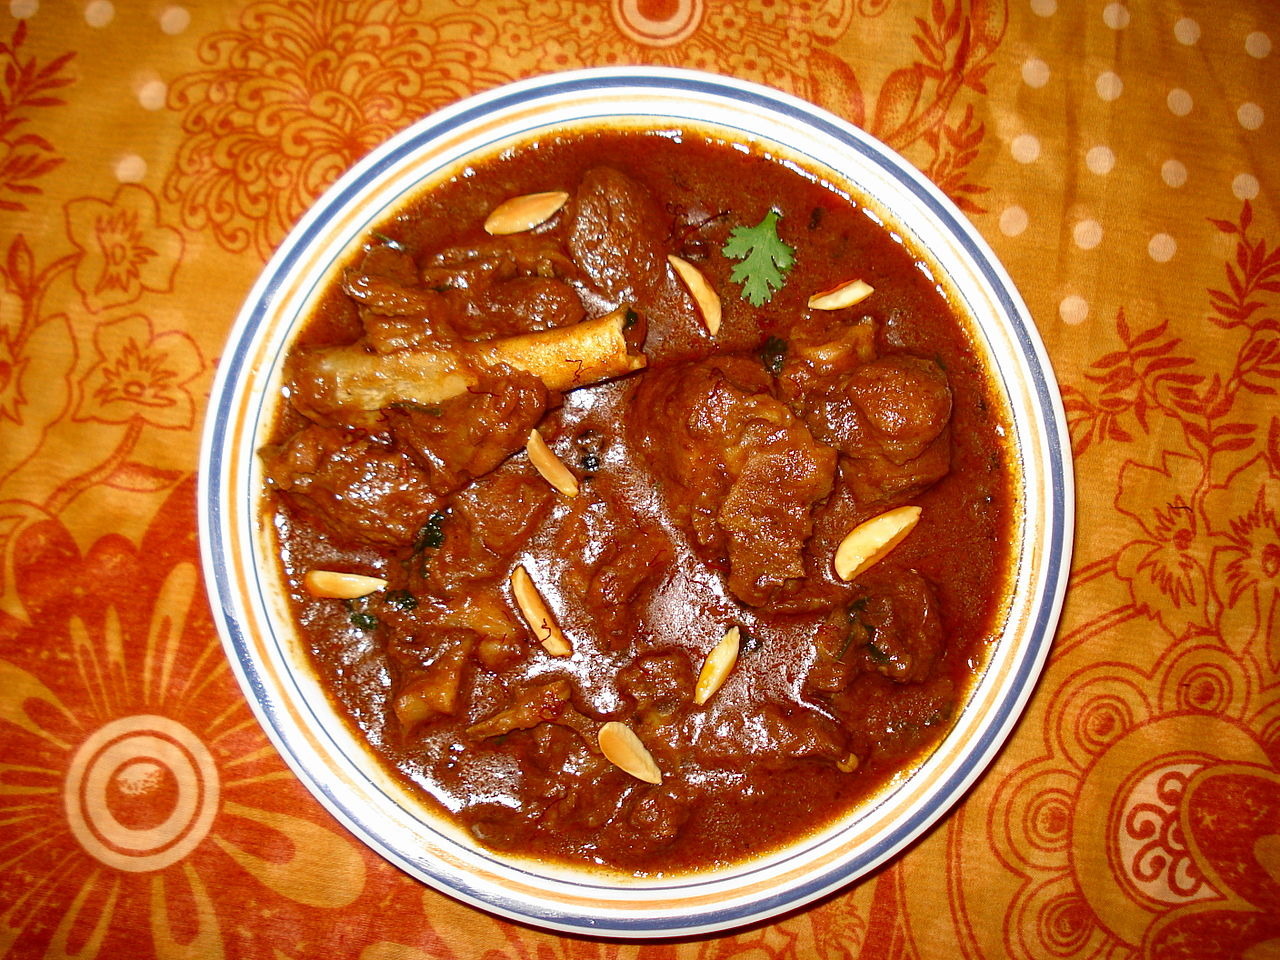 File:Rogan Josh.JPG - Wikipedia